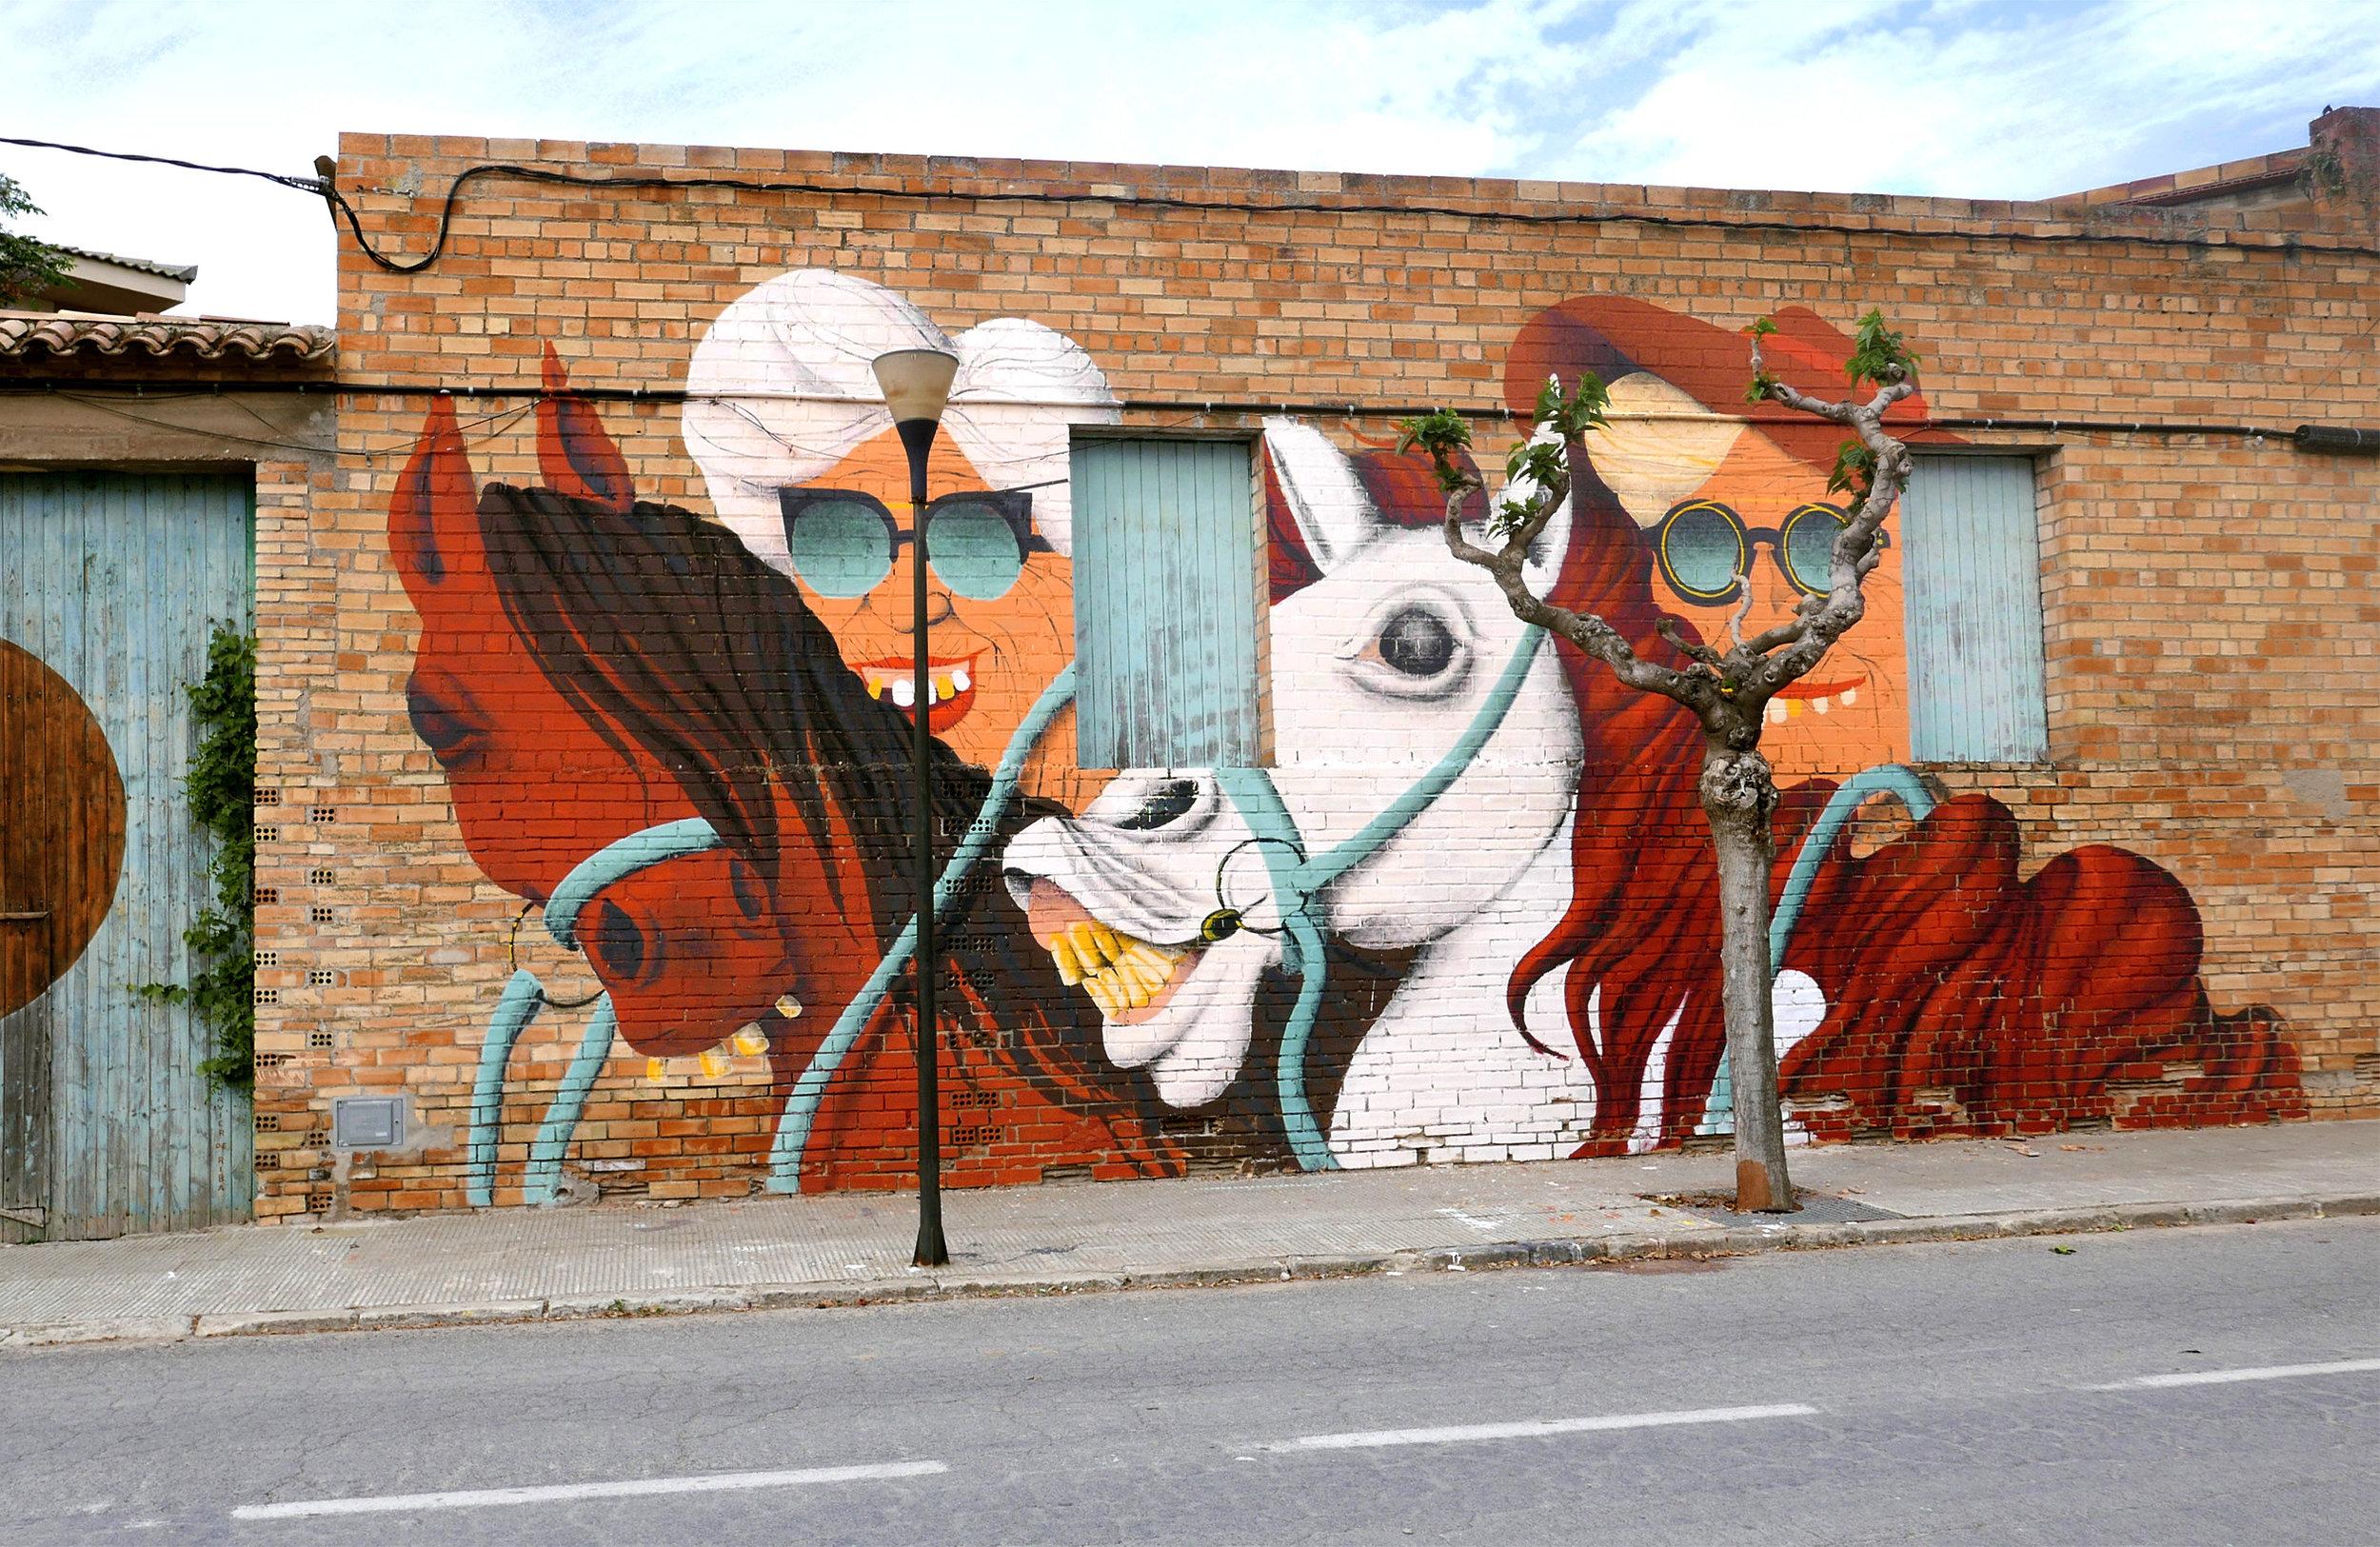 Mural painted during the Festival Gargar in Penelles, Spain, 2016. Photo by Bali Green